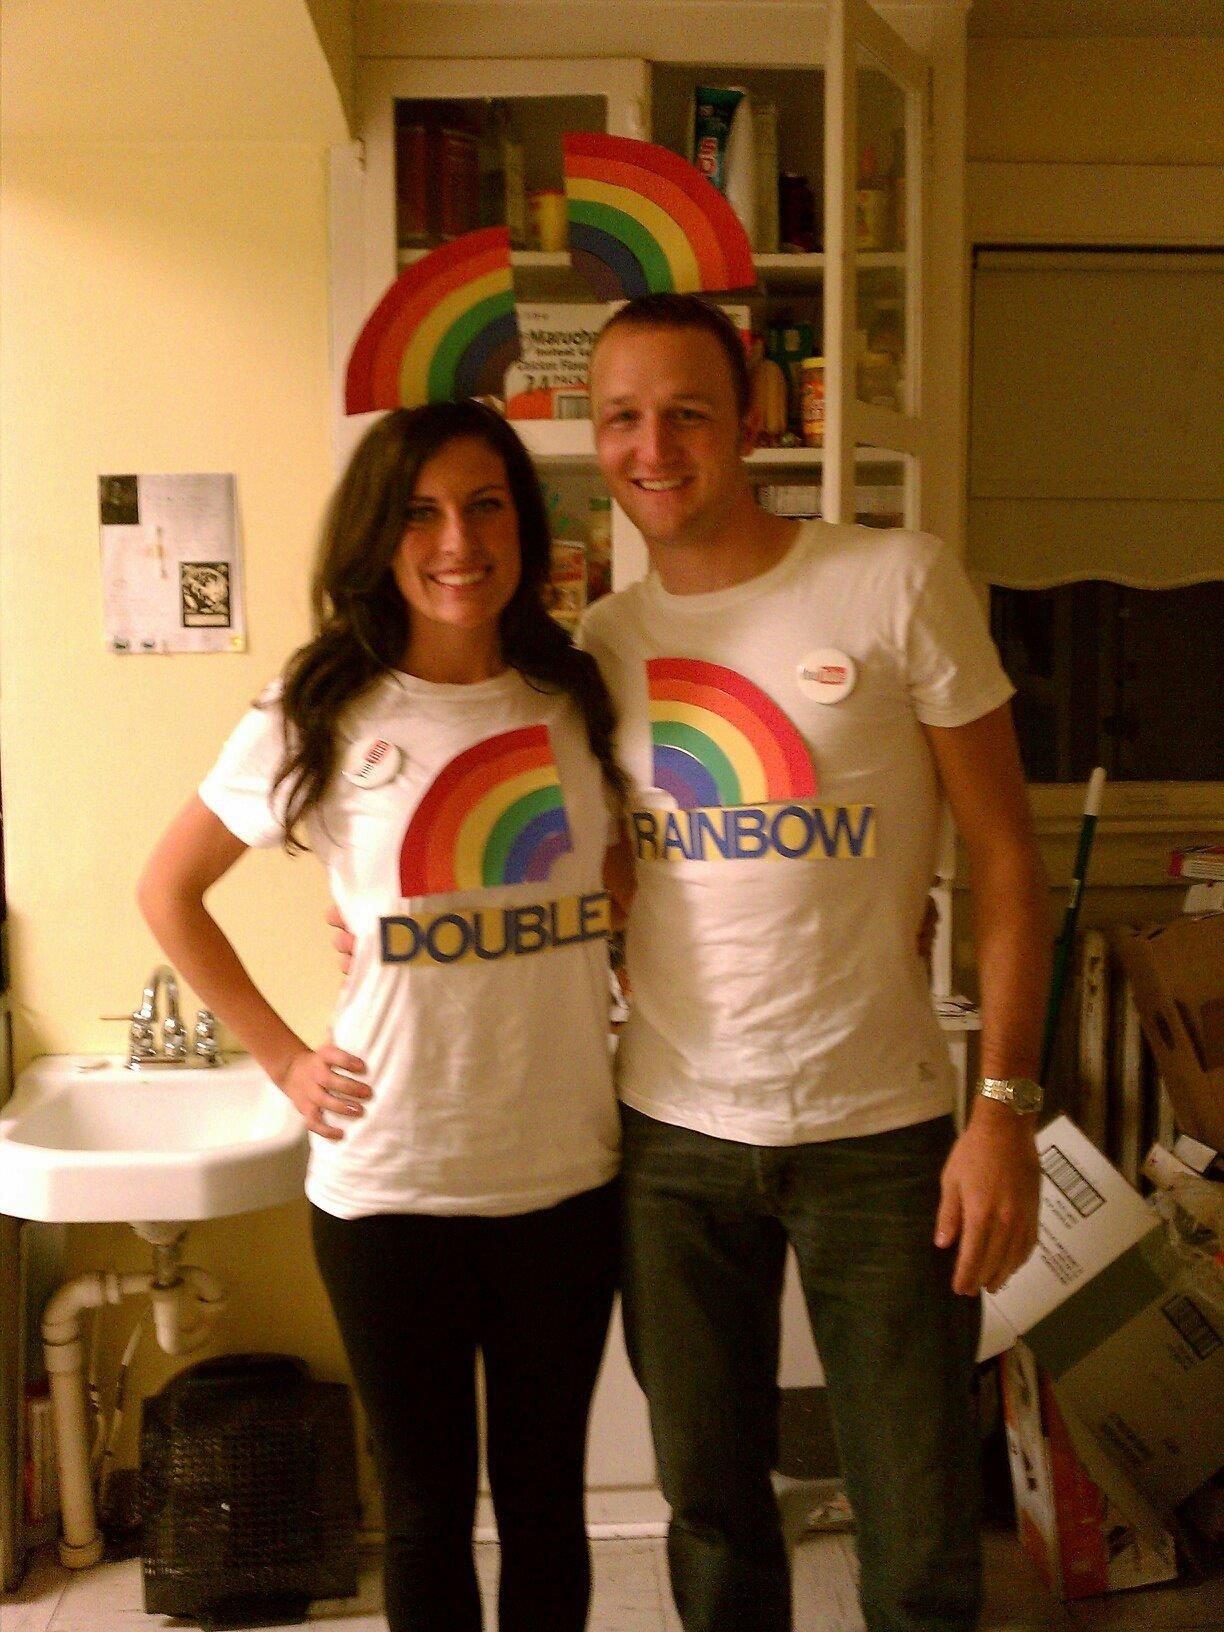 10 Spectacular Cool Couple Halloween Costume Ideas couples halloween costume double rainbow see youtube video omg i 3 2021